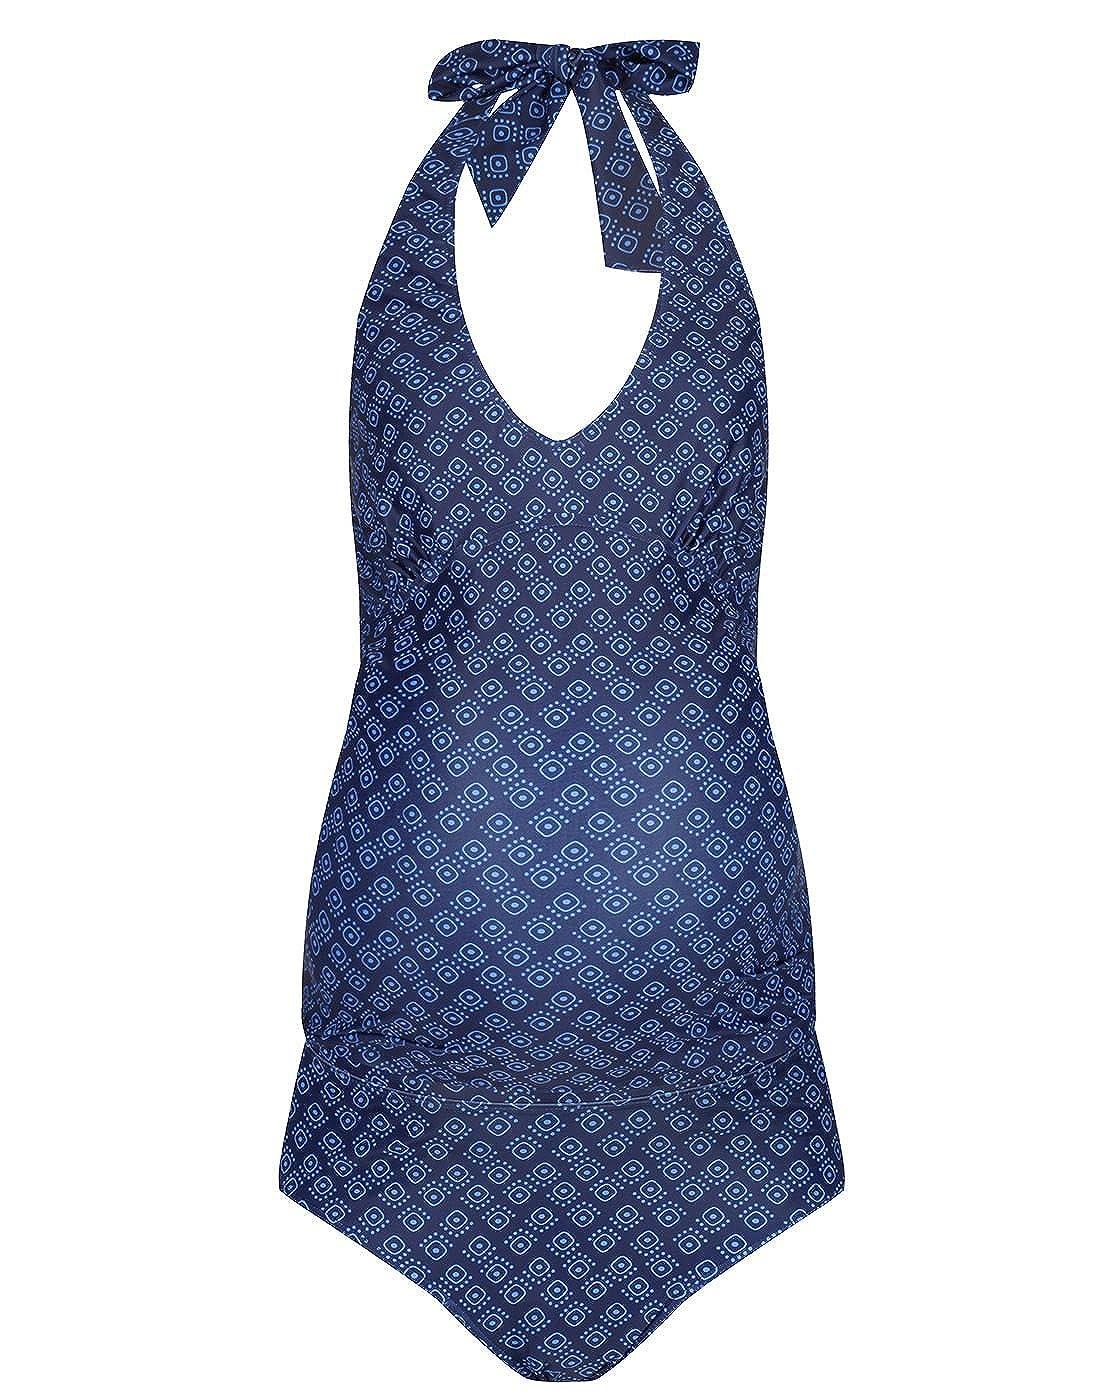 The Essential One - Mujeres Maternidad Tankini Geo - Azul Marino - EOM211: Amazon.es: Ropa y accesorios